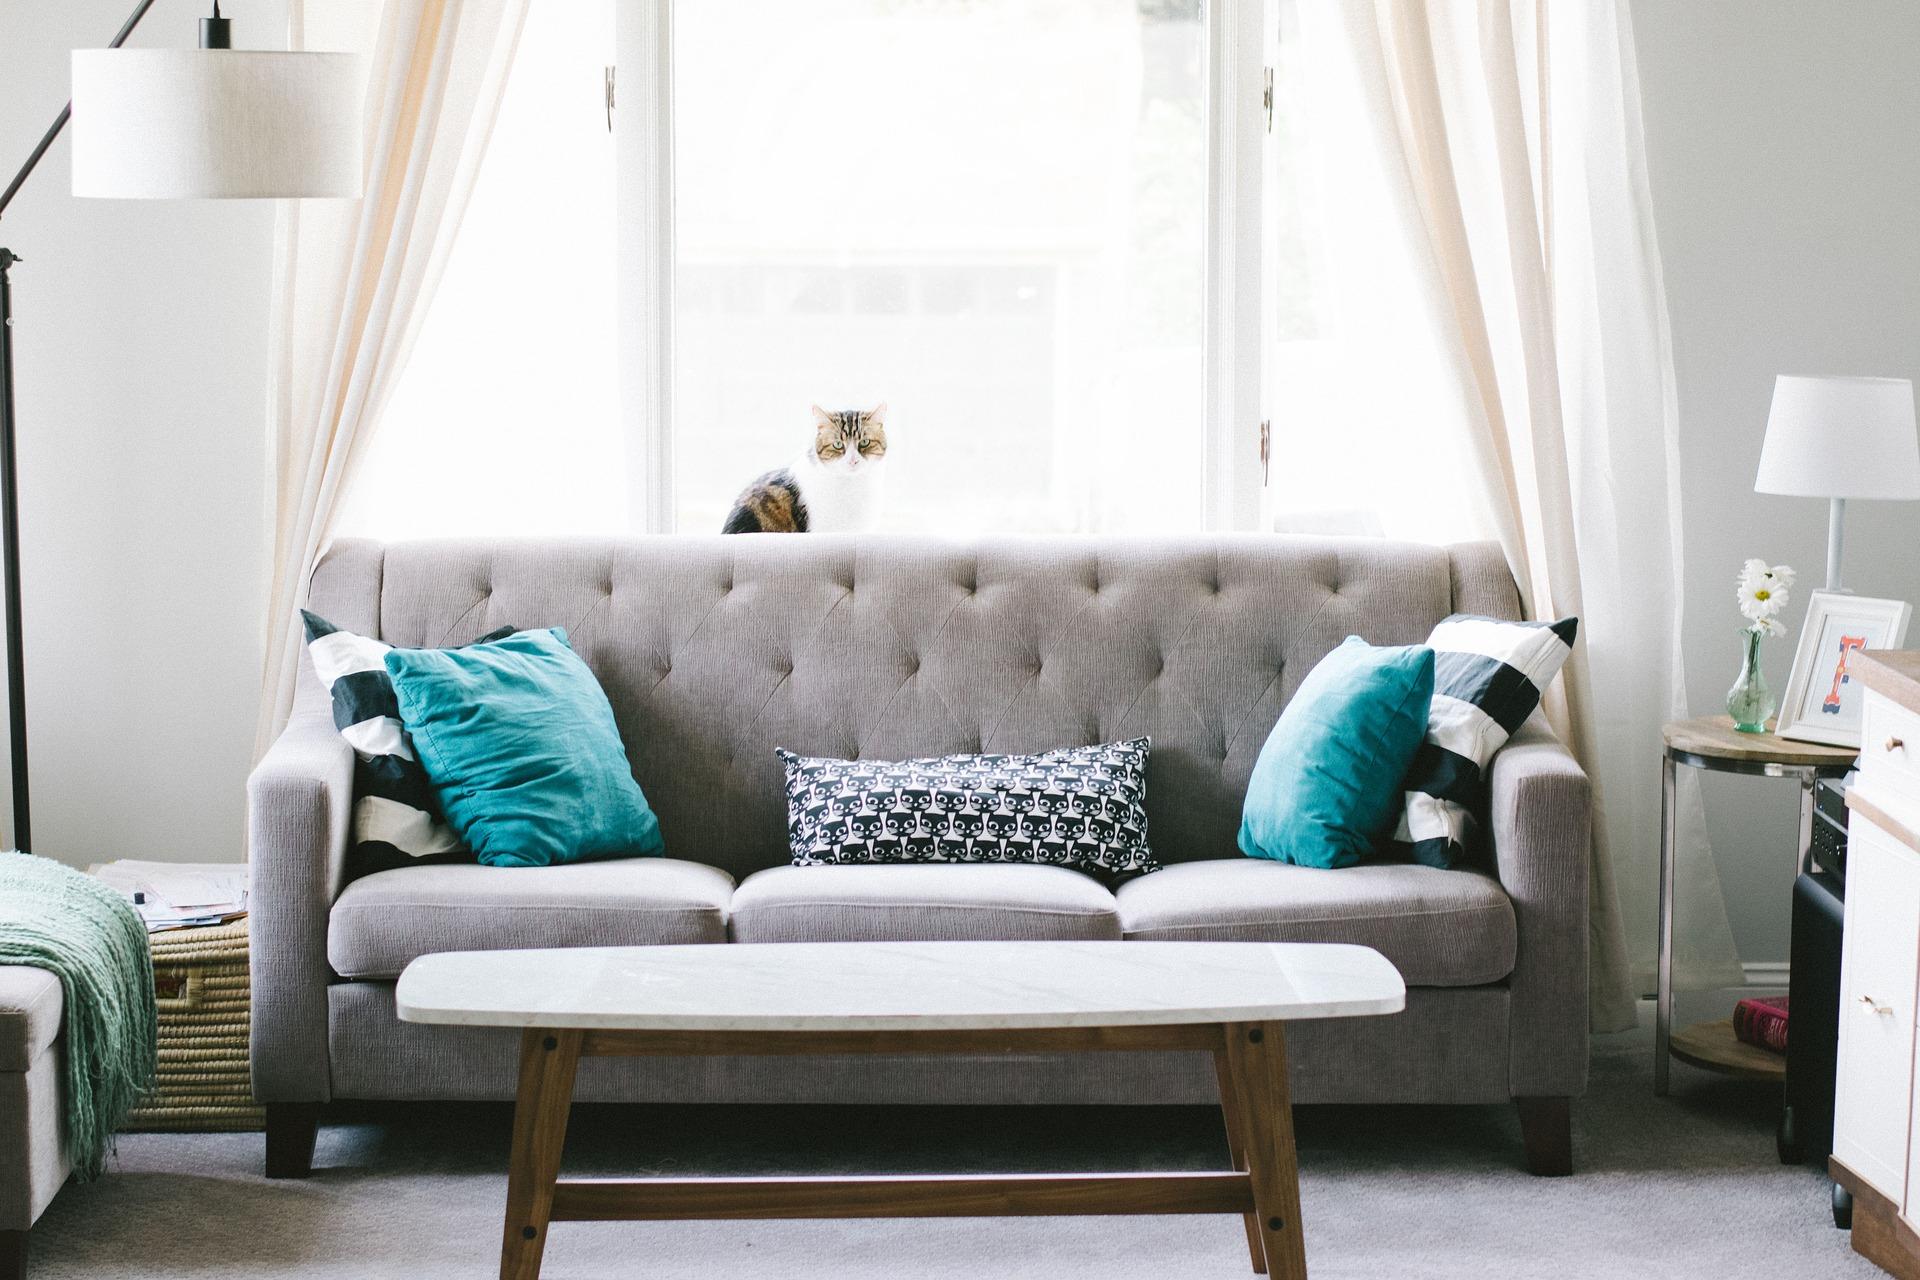 Oživení interiéru nemusí být drahé